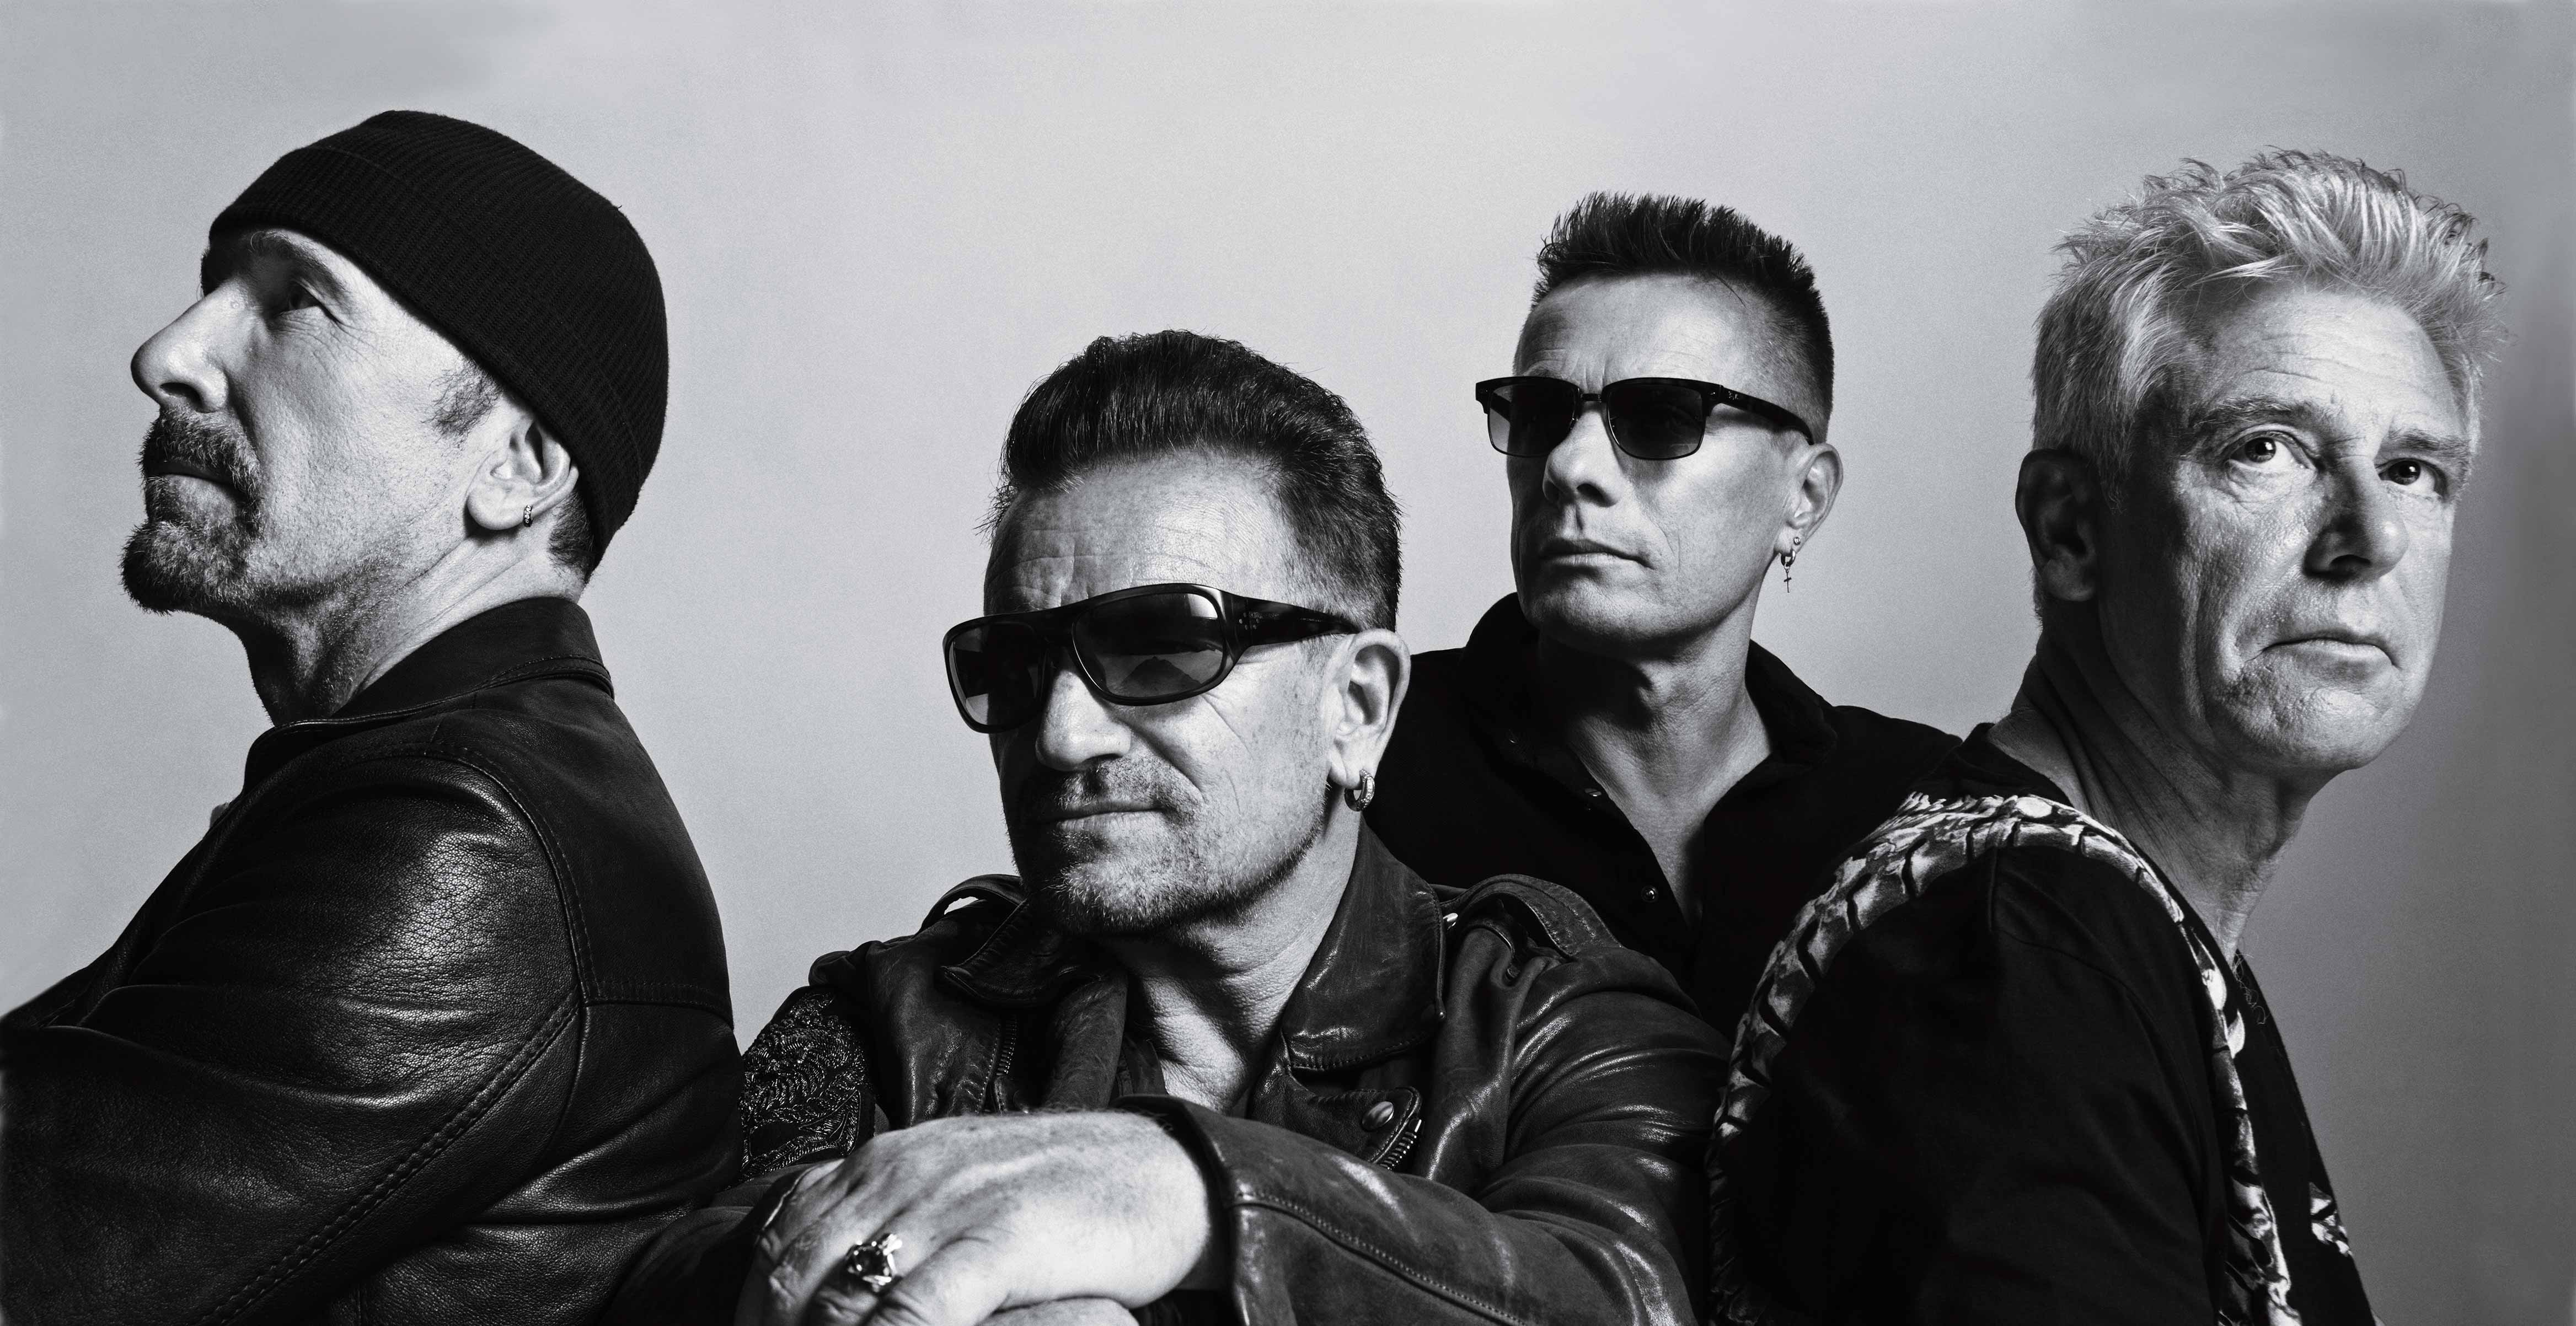 U2 Backgrounds on Wallpapers Vista